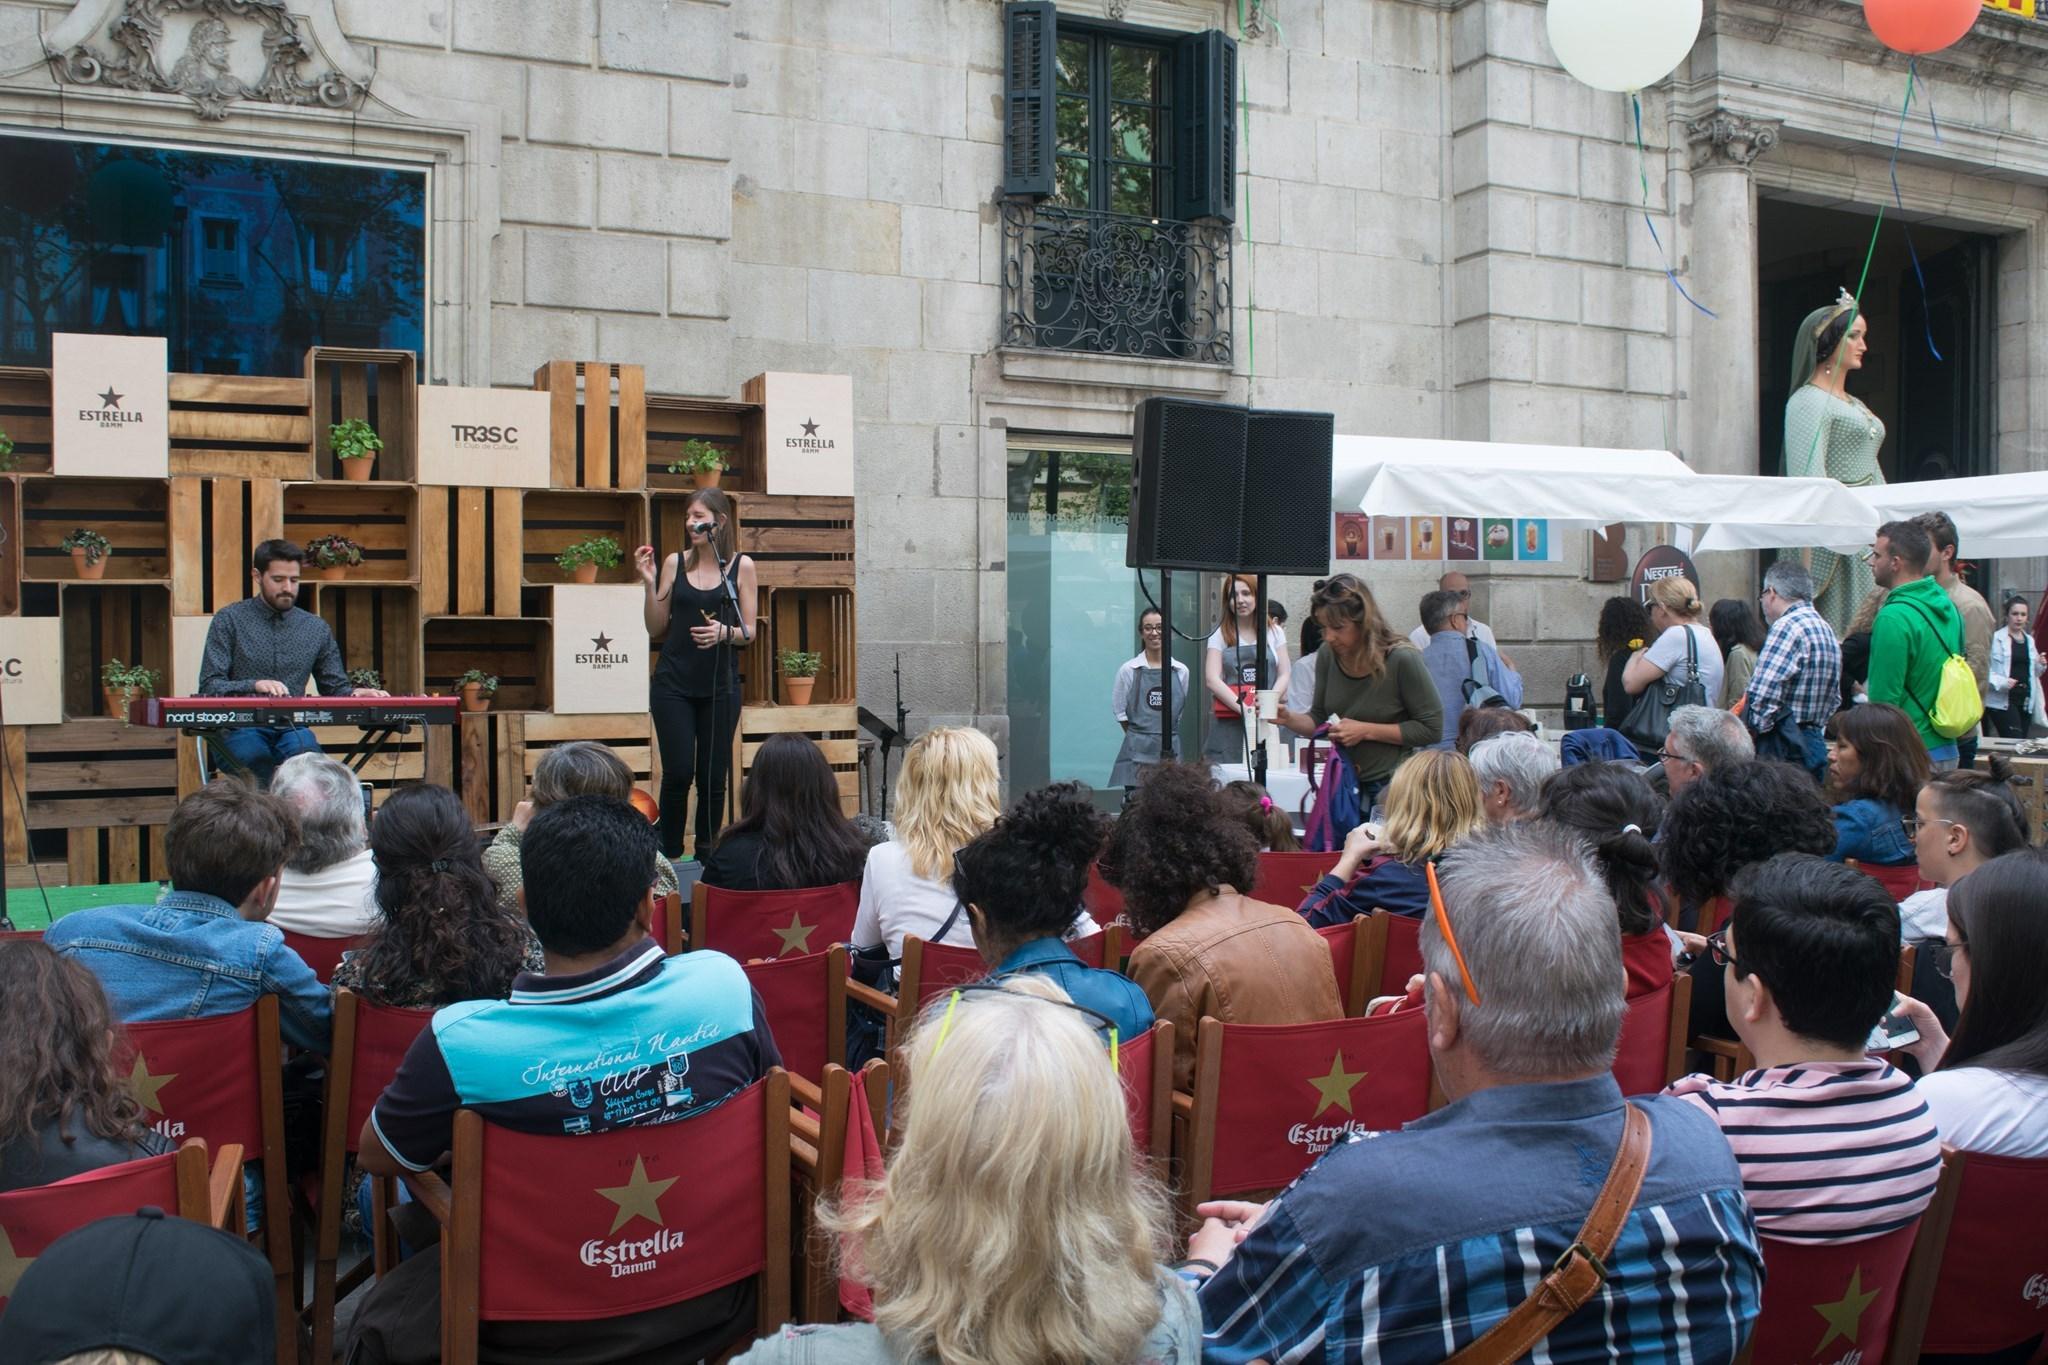 12è Aniversari TR3SC: Espai Sant Jordi